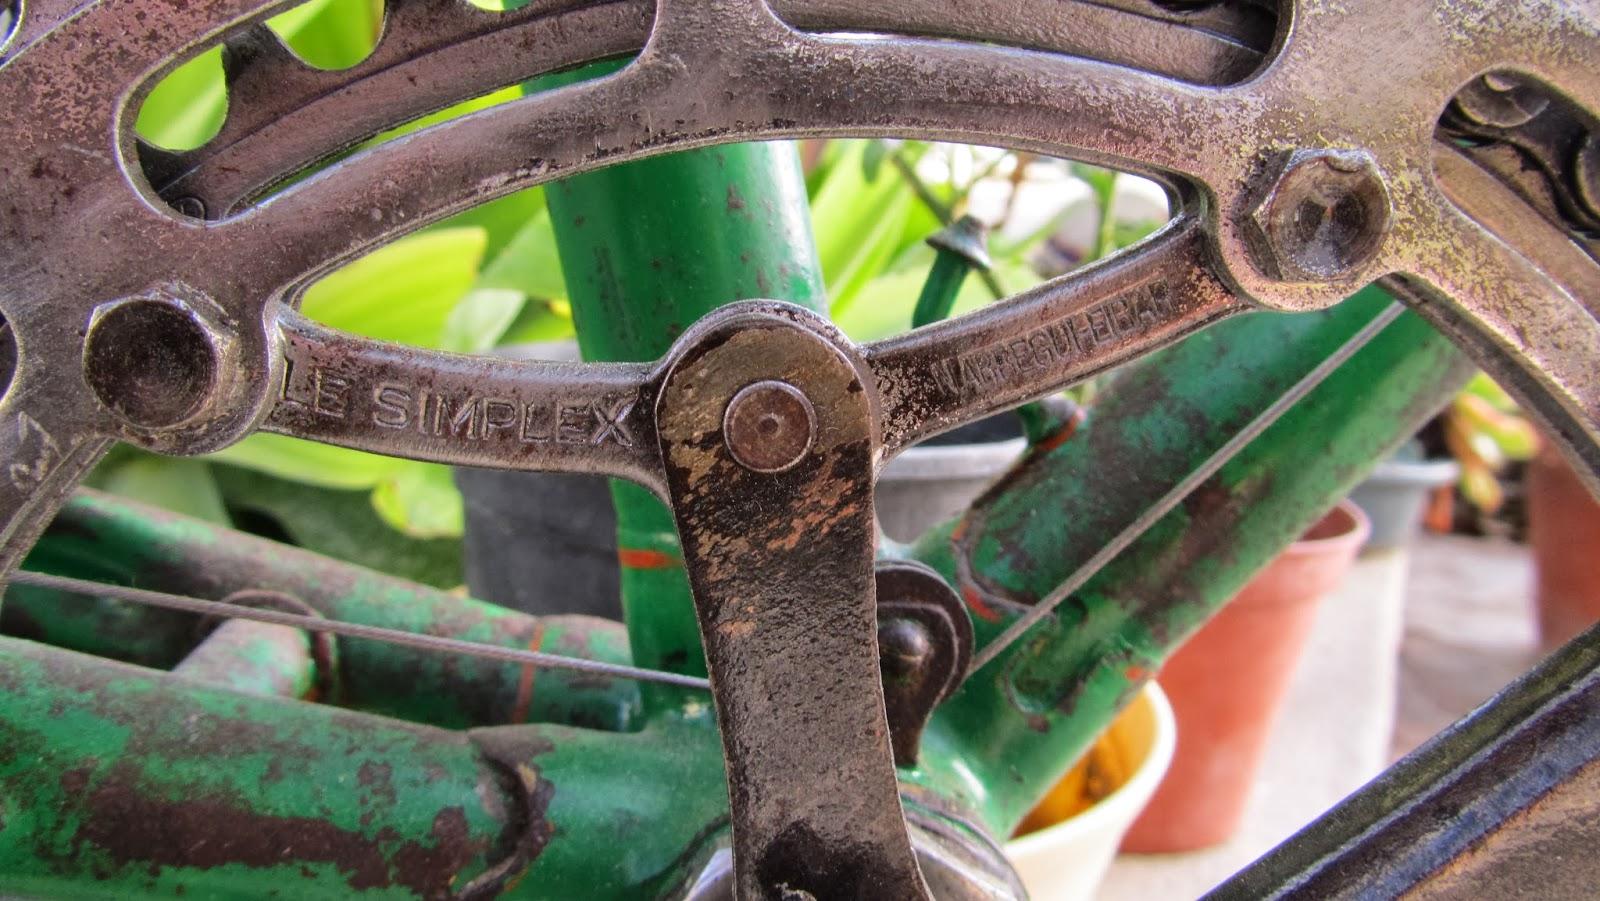 Plato simplex - Bicicleta Clásica Emporium - Ciclos Cataluña